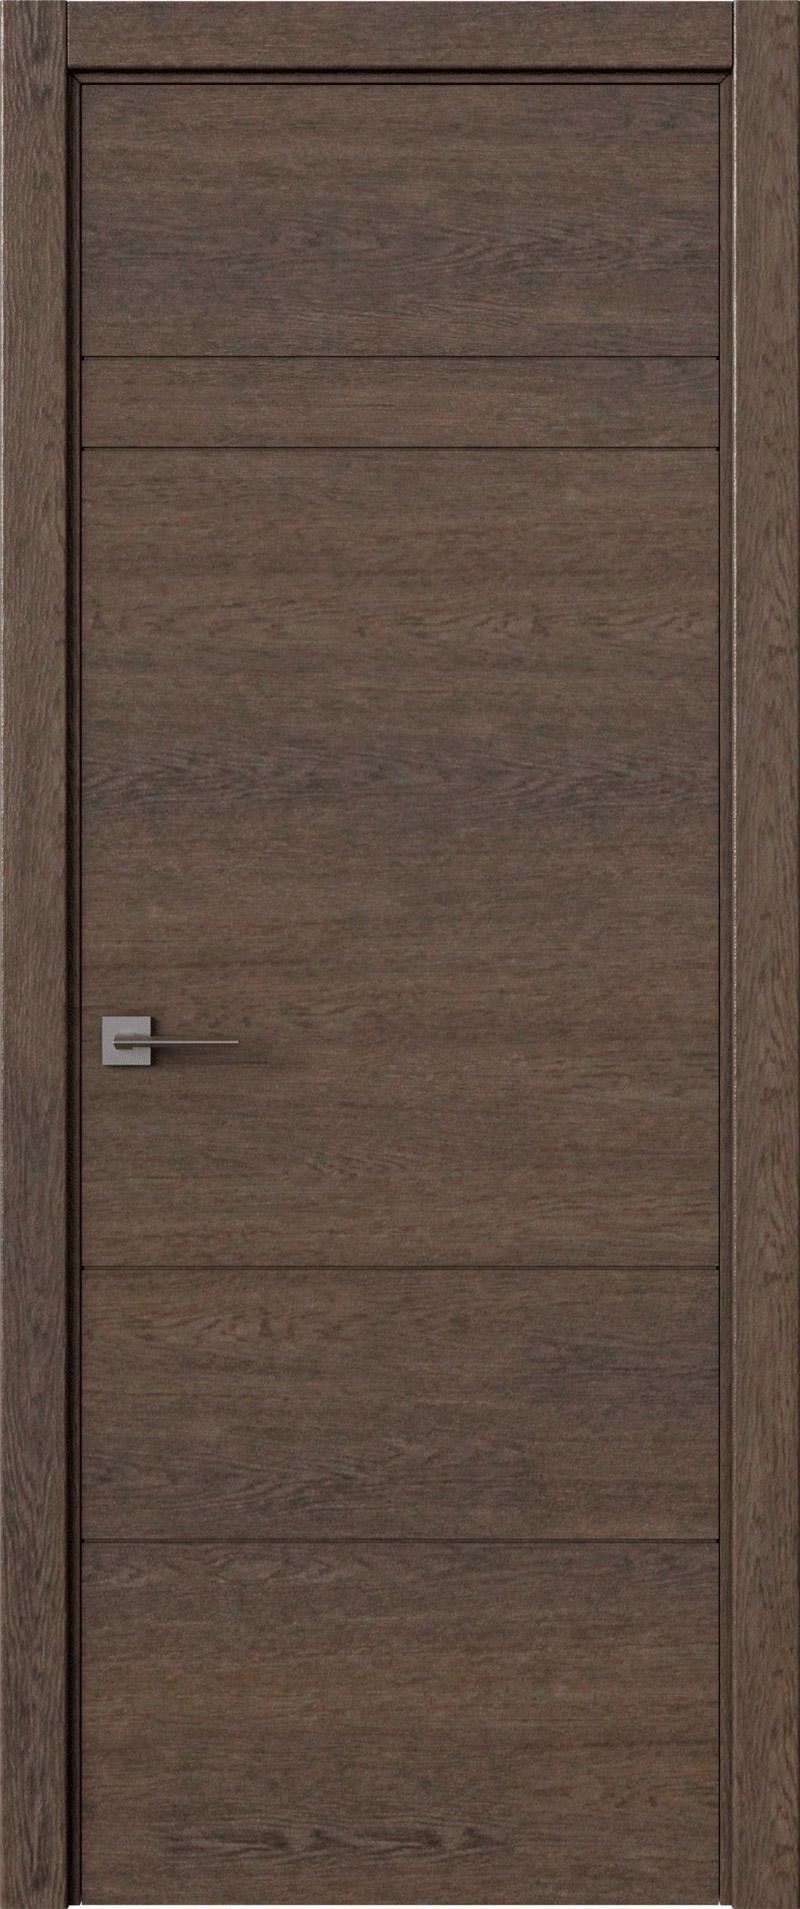 Tivoli К-2 цвет - Дуб антик Без стекла (ДГ)